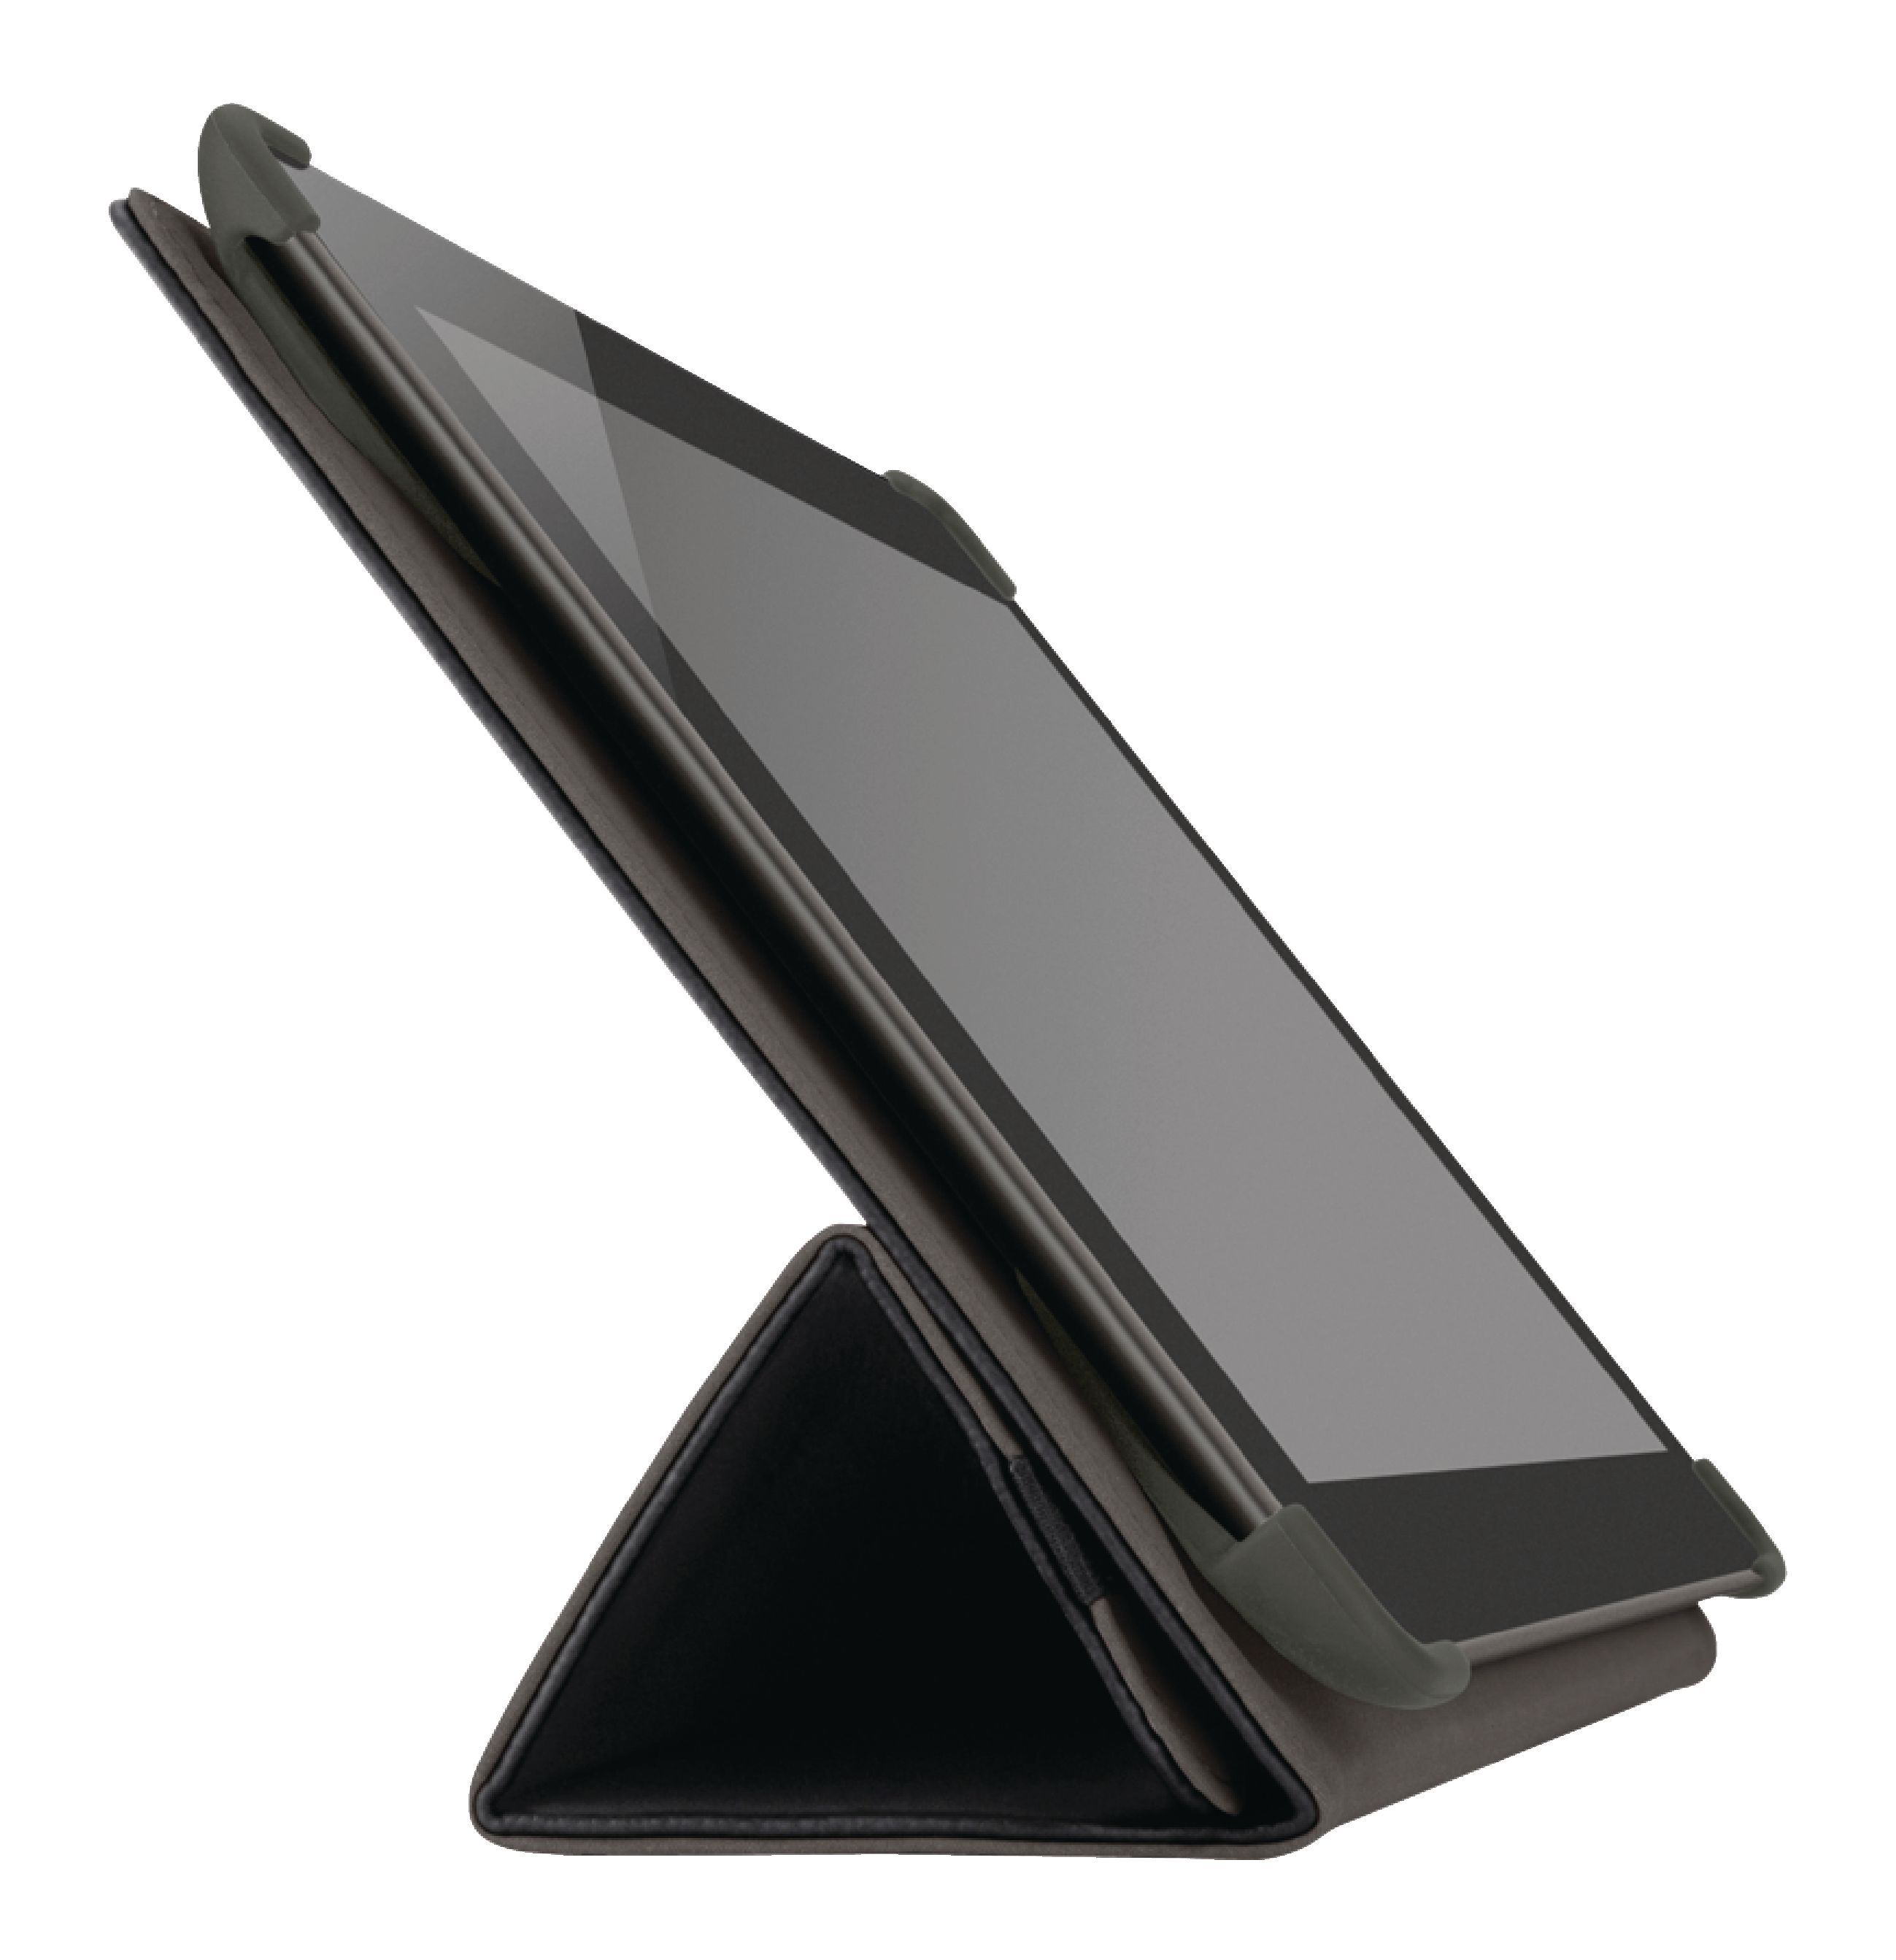 accbel00960b belkin etui de protection pour tablette. Black Bedroom Furniture Sets. Home Design Ideas